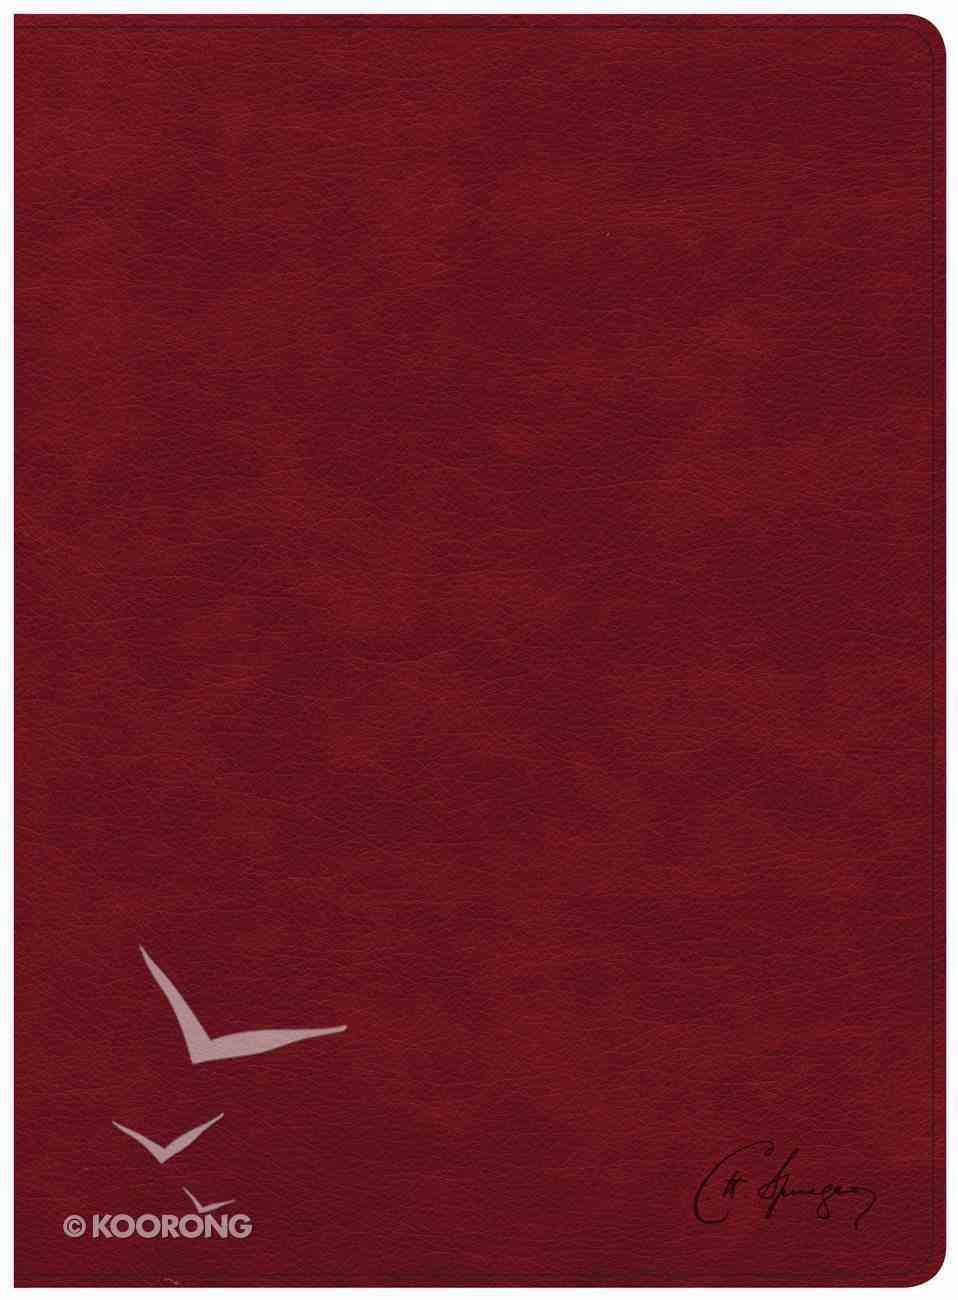 KJV Spurgeon Study Bible Crimson Imitation Leather